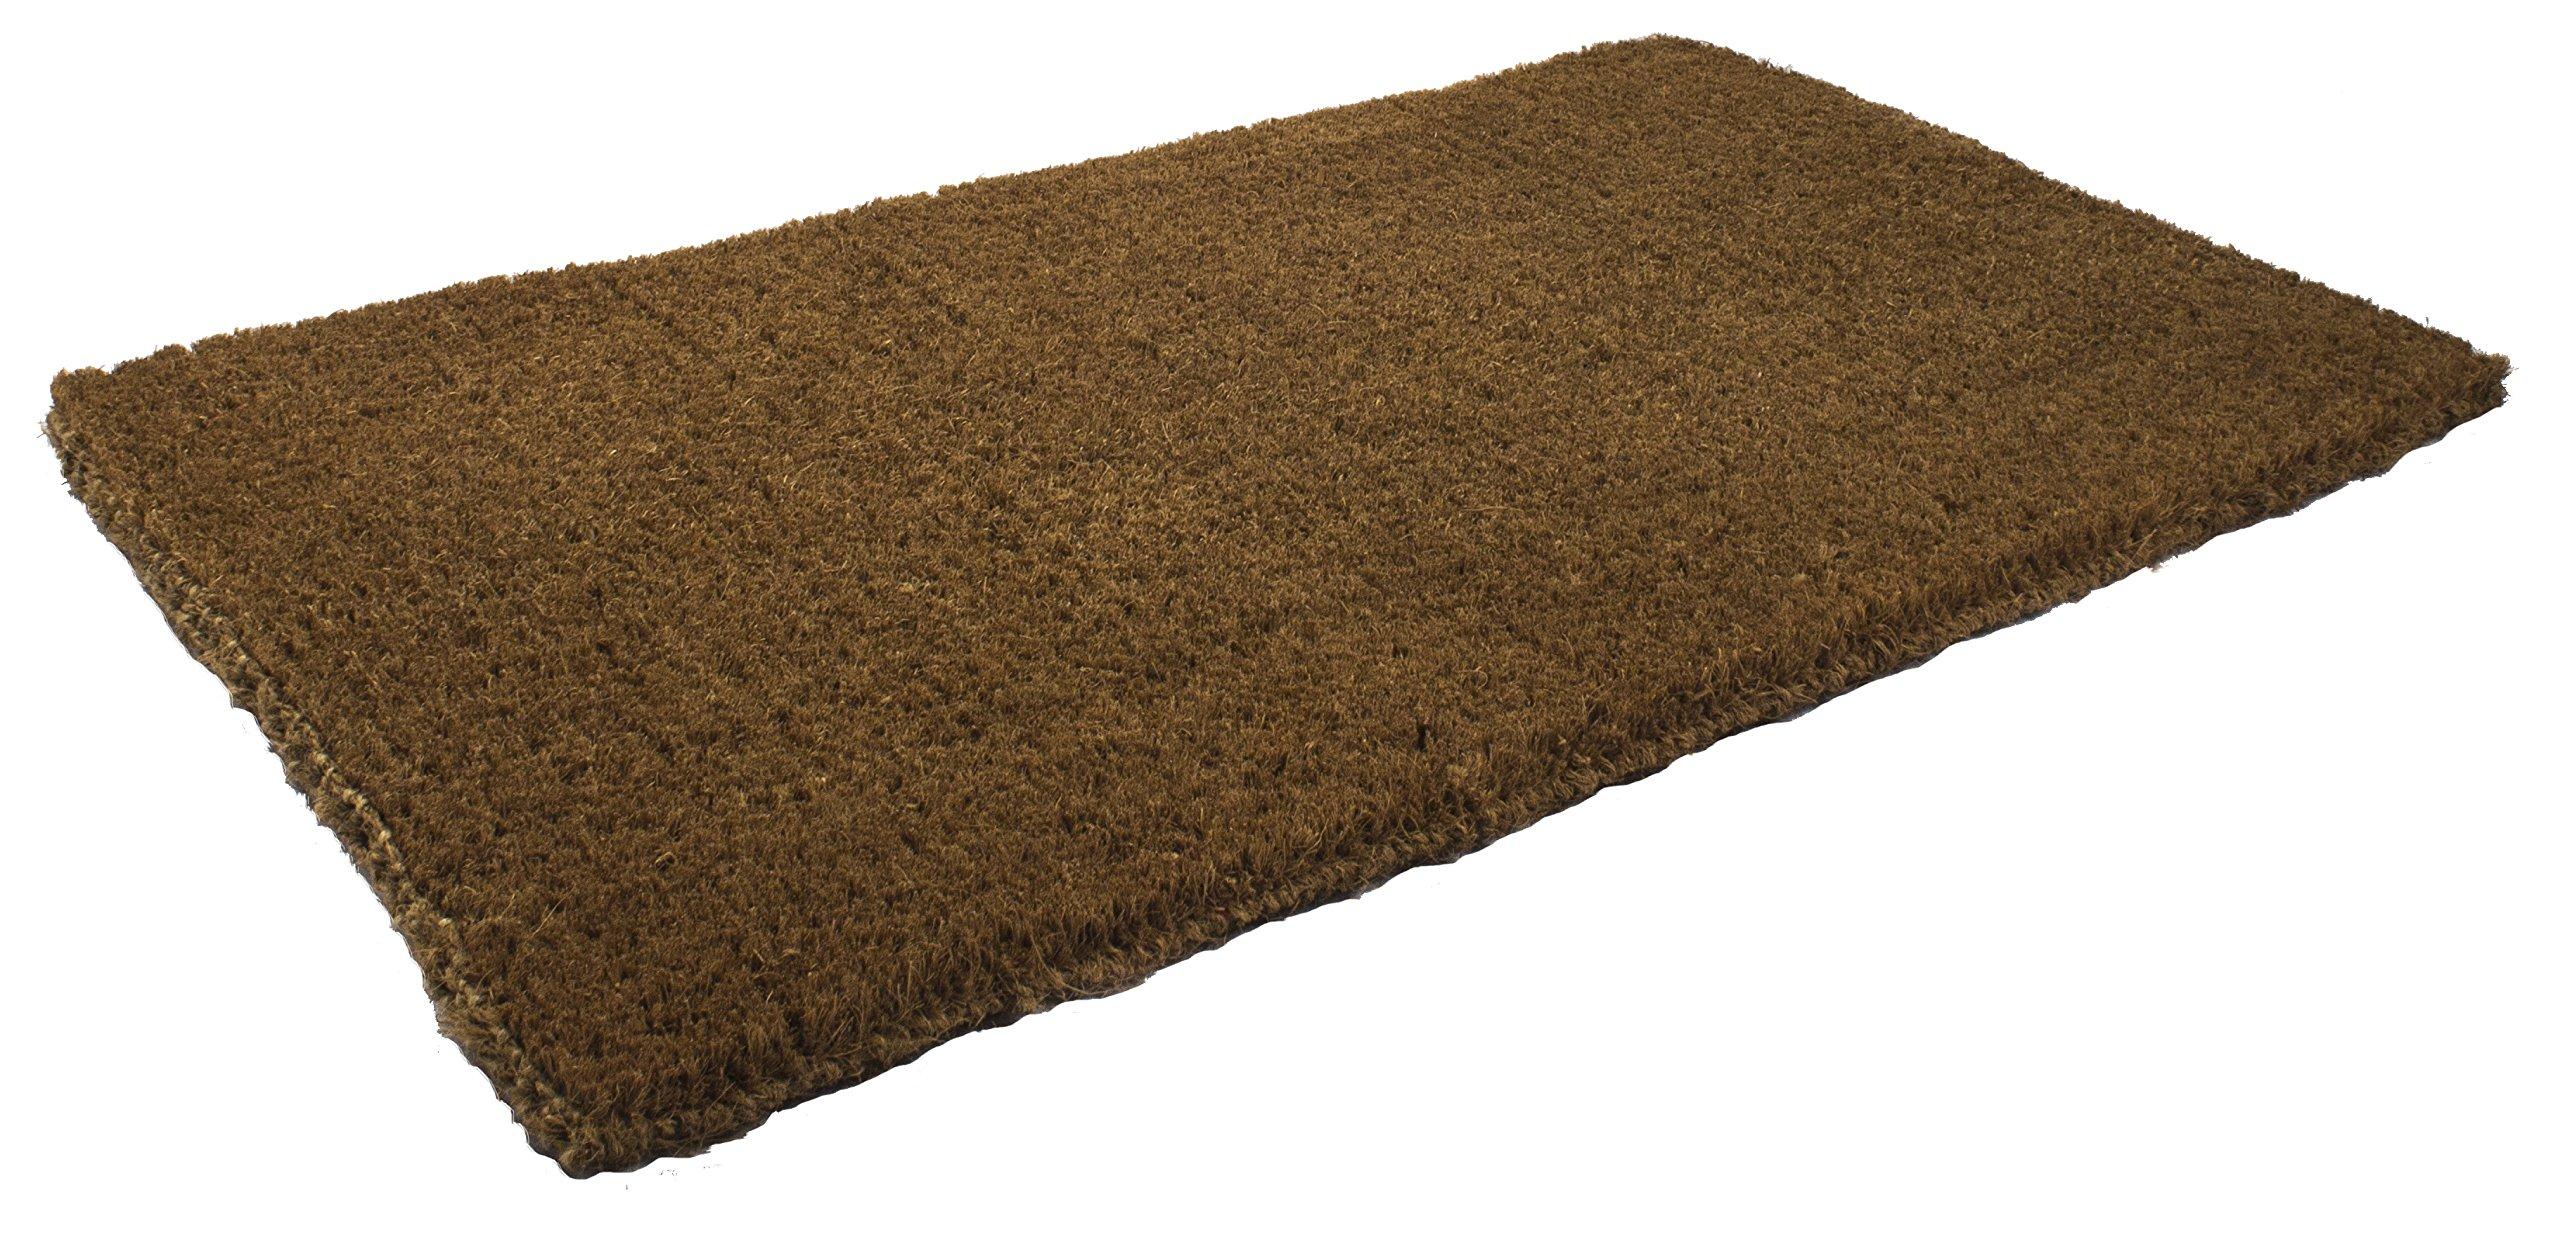 Entryways Blank Extra Thick Handmade, All-Natural Coconut Fiber Coir Doormat 18'' X 30'' X 1.5''